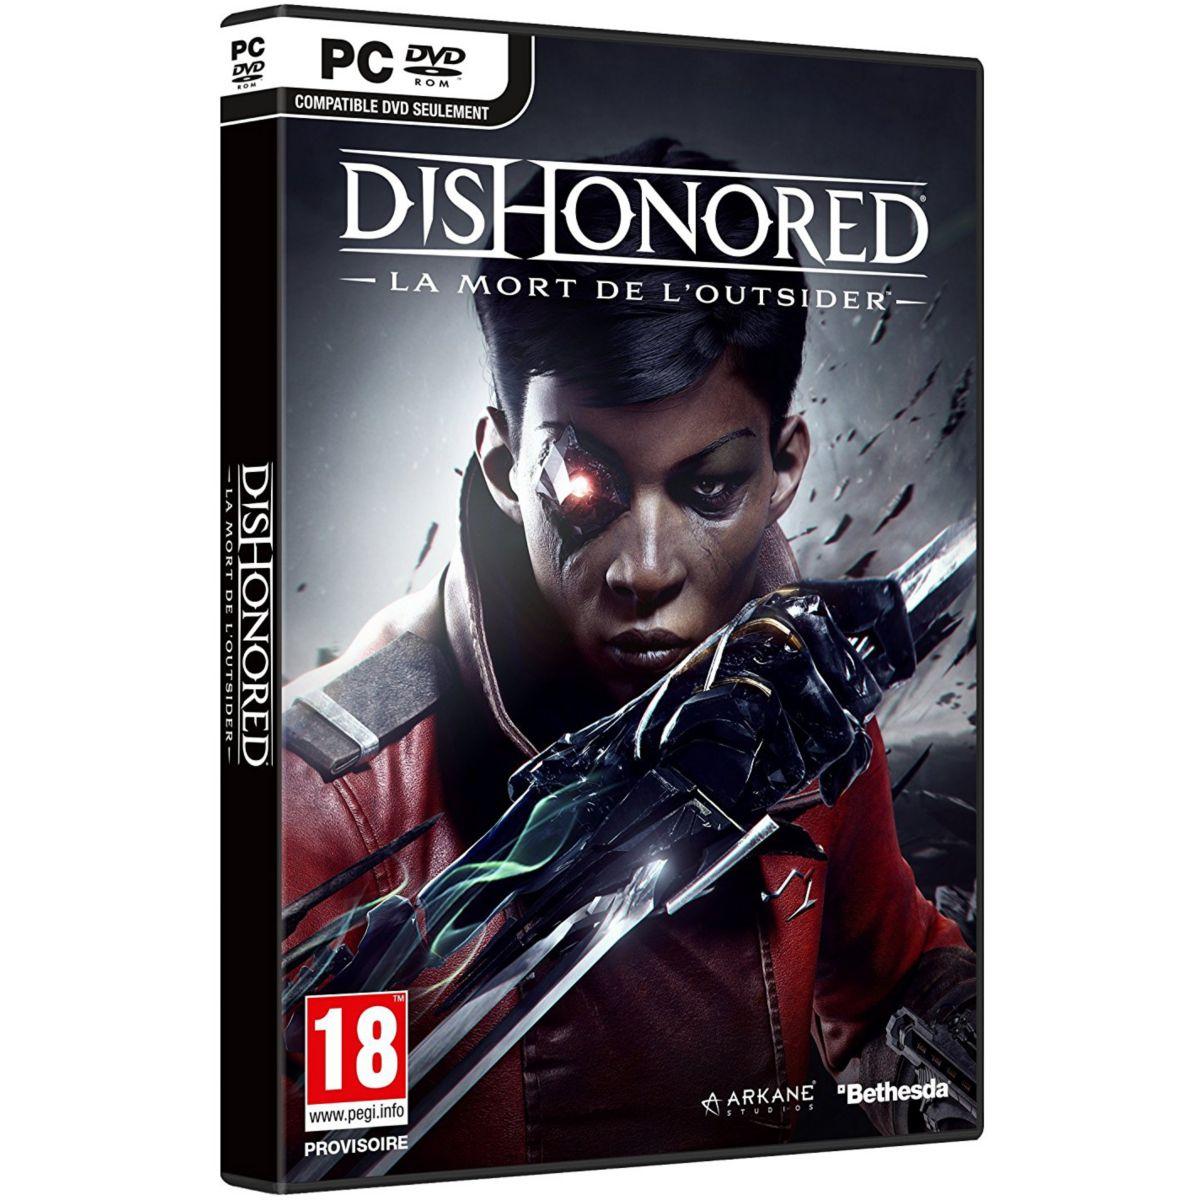 Jeu PC BETHESDA Dishonored 2 La Mort de l'Outsider (photo)